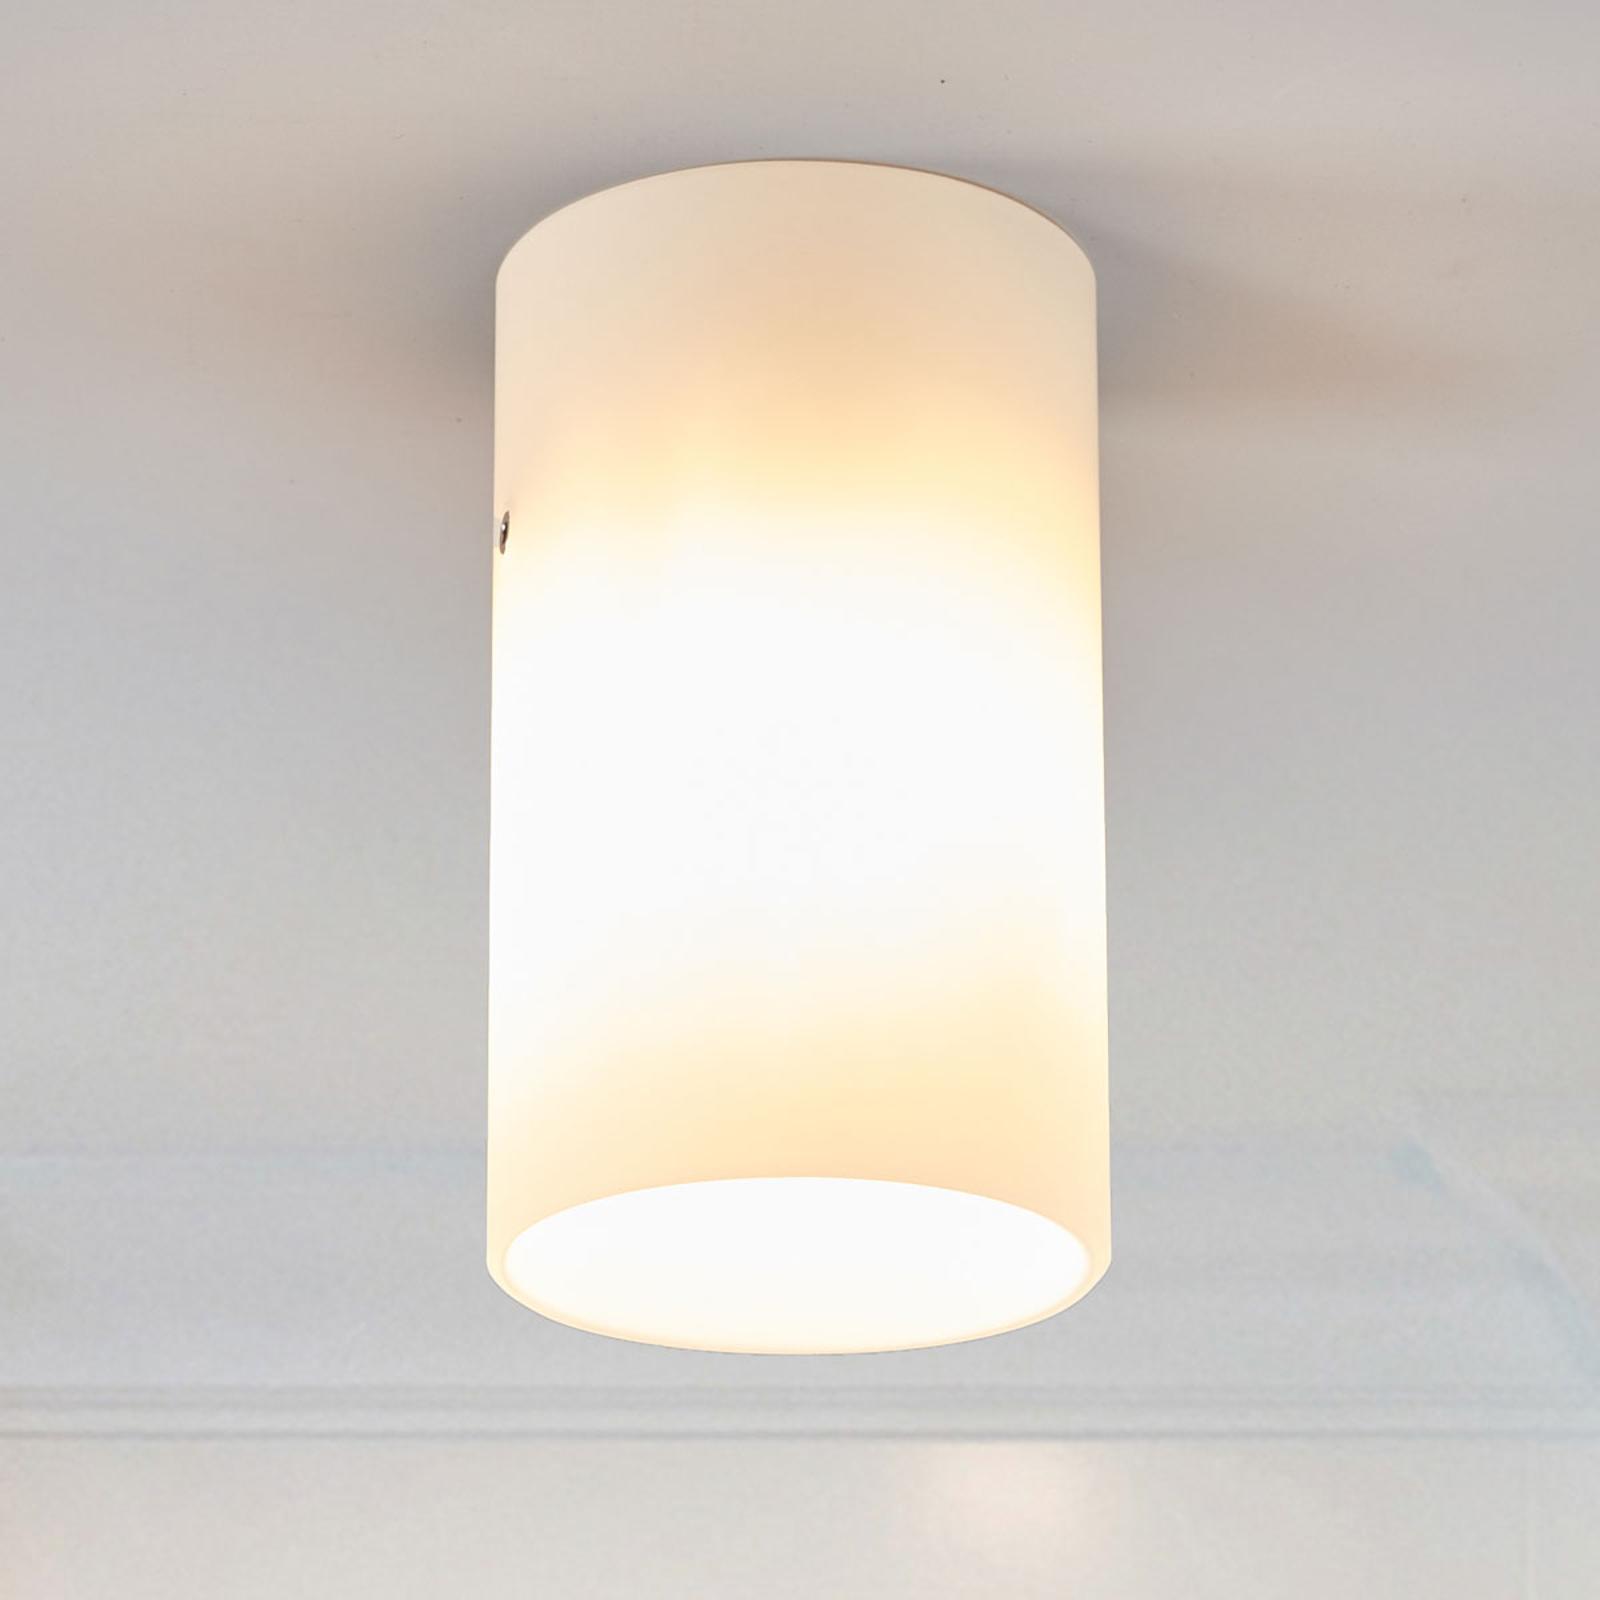 Okrągła lampa sufitowa Tube